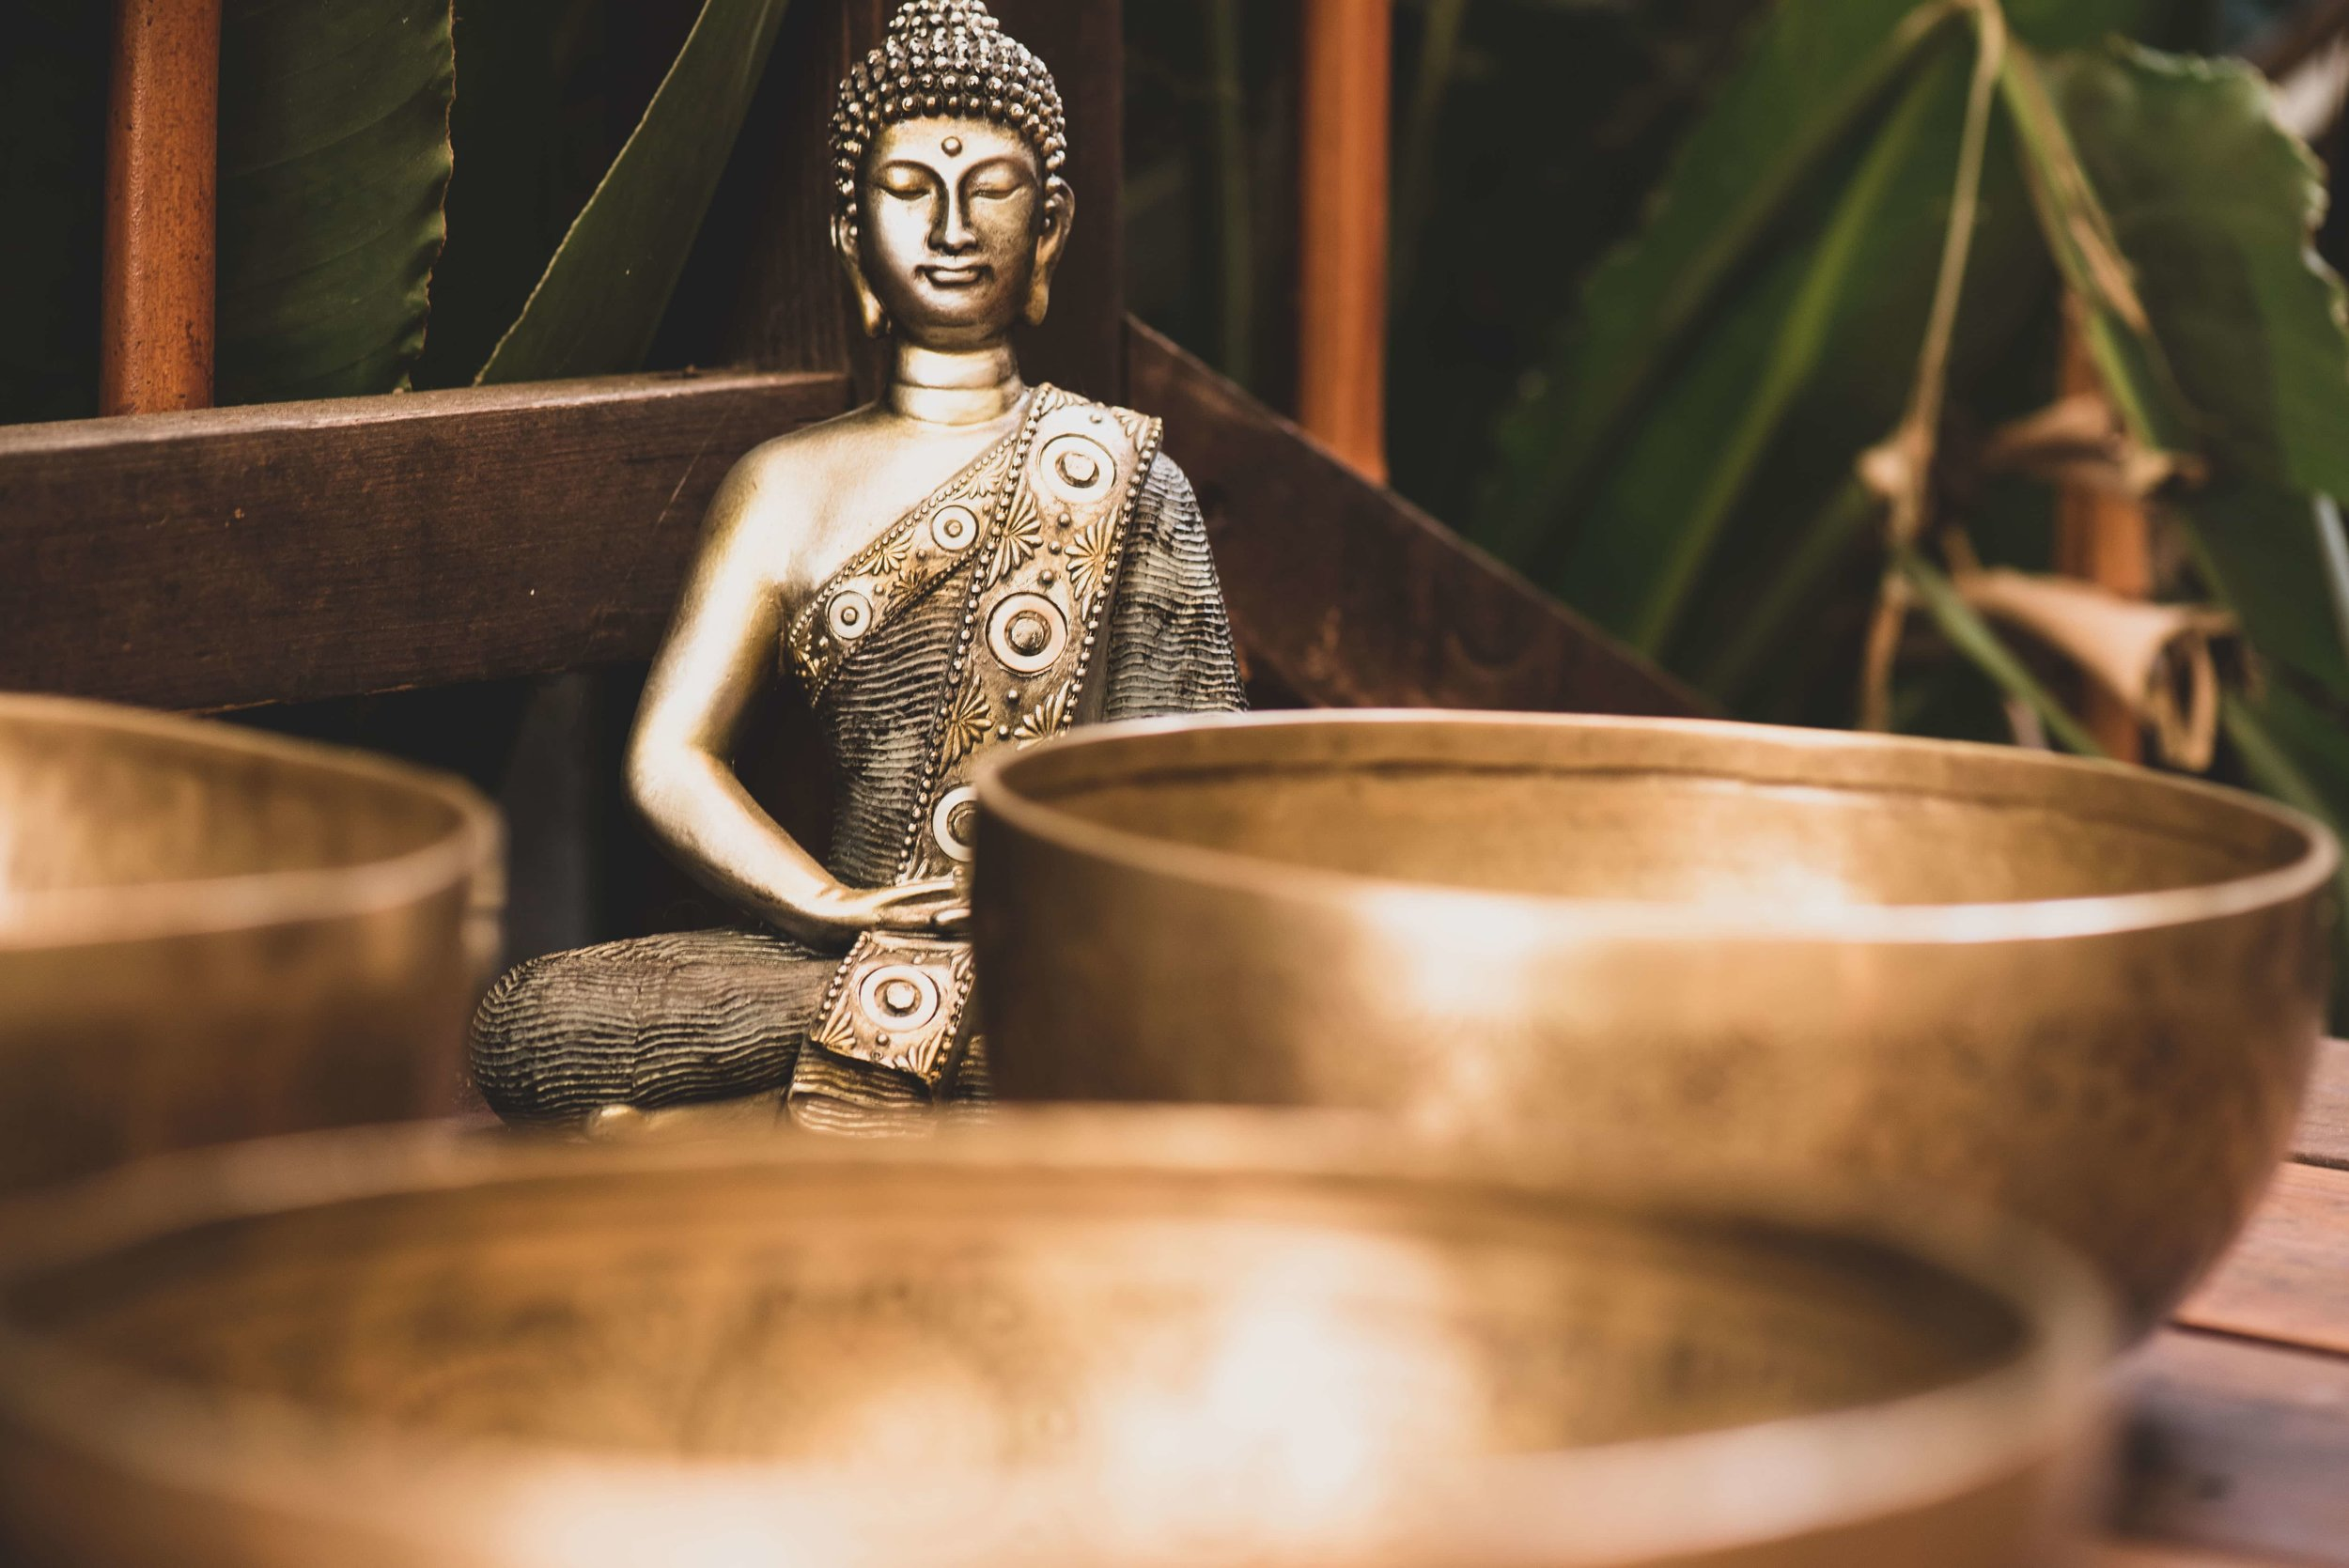 sound_buddha_bowls-min.jpg